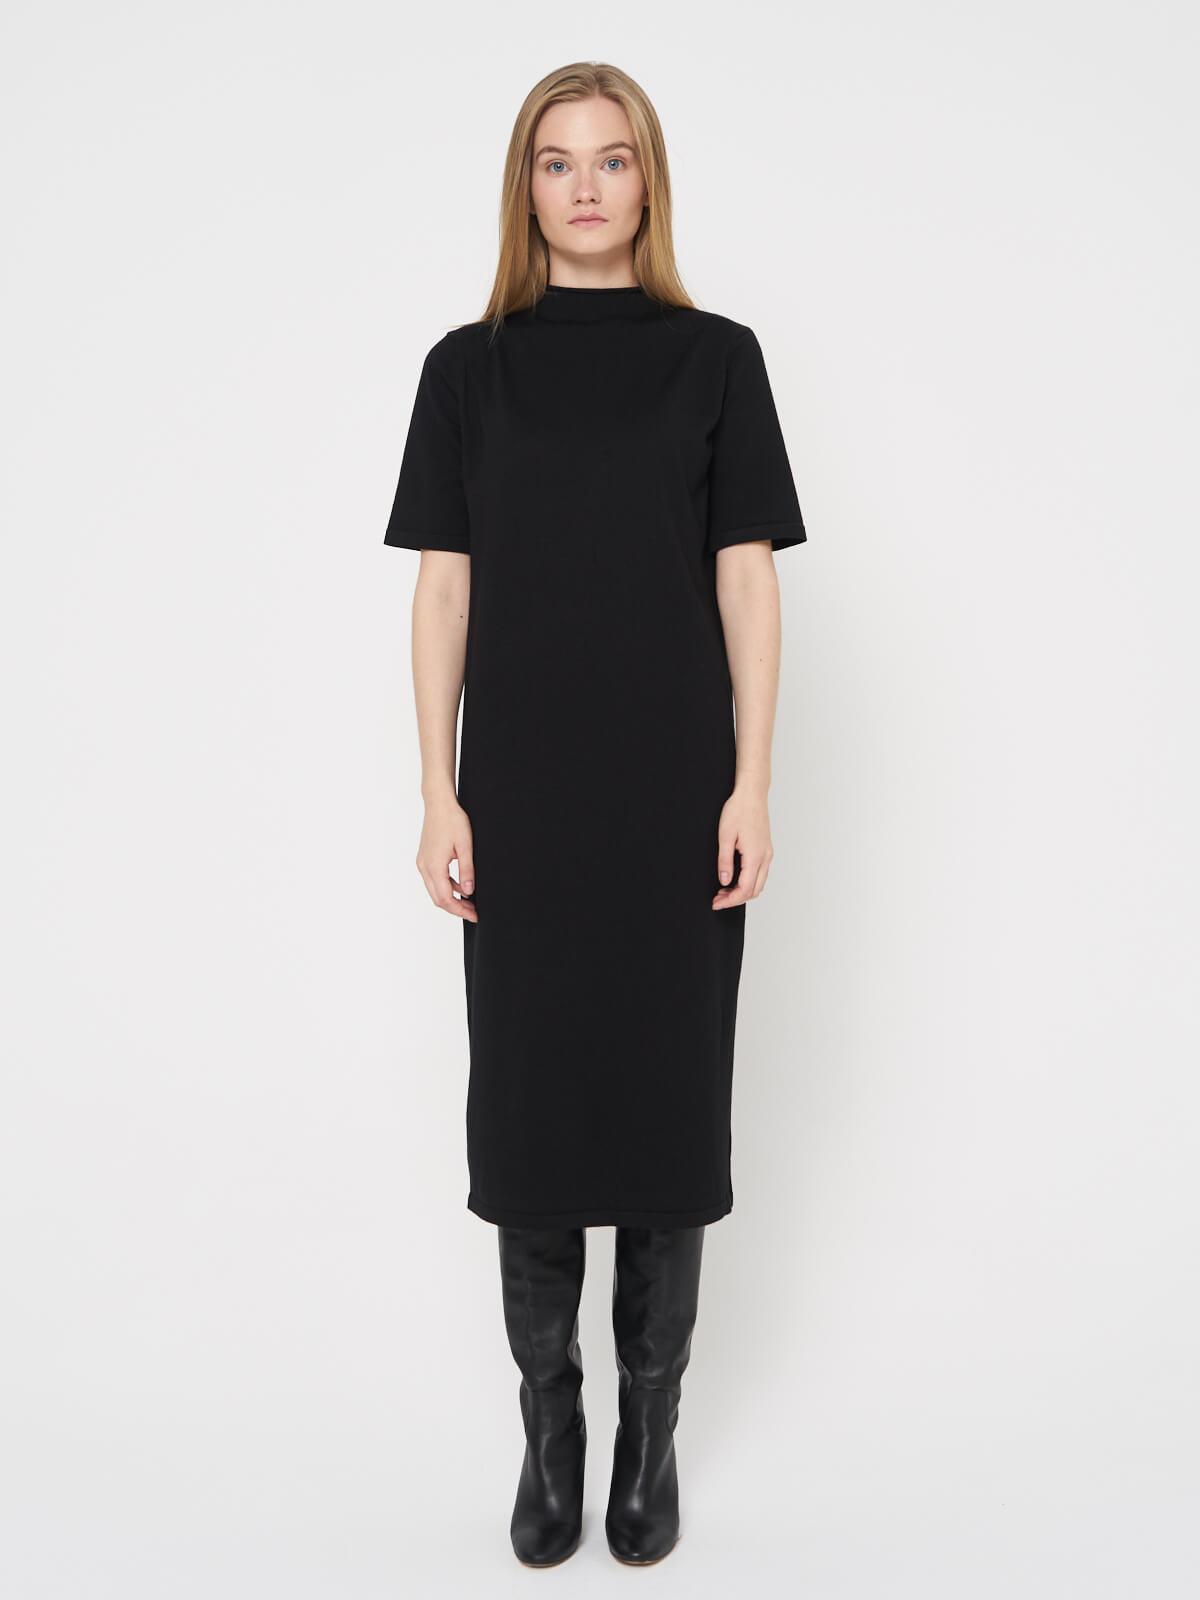 Платье трикотажнгое с коротким рукавом